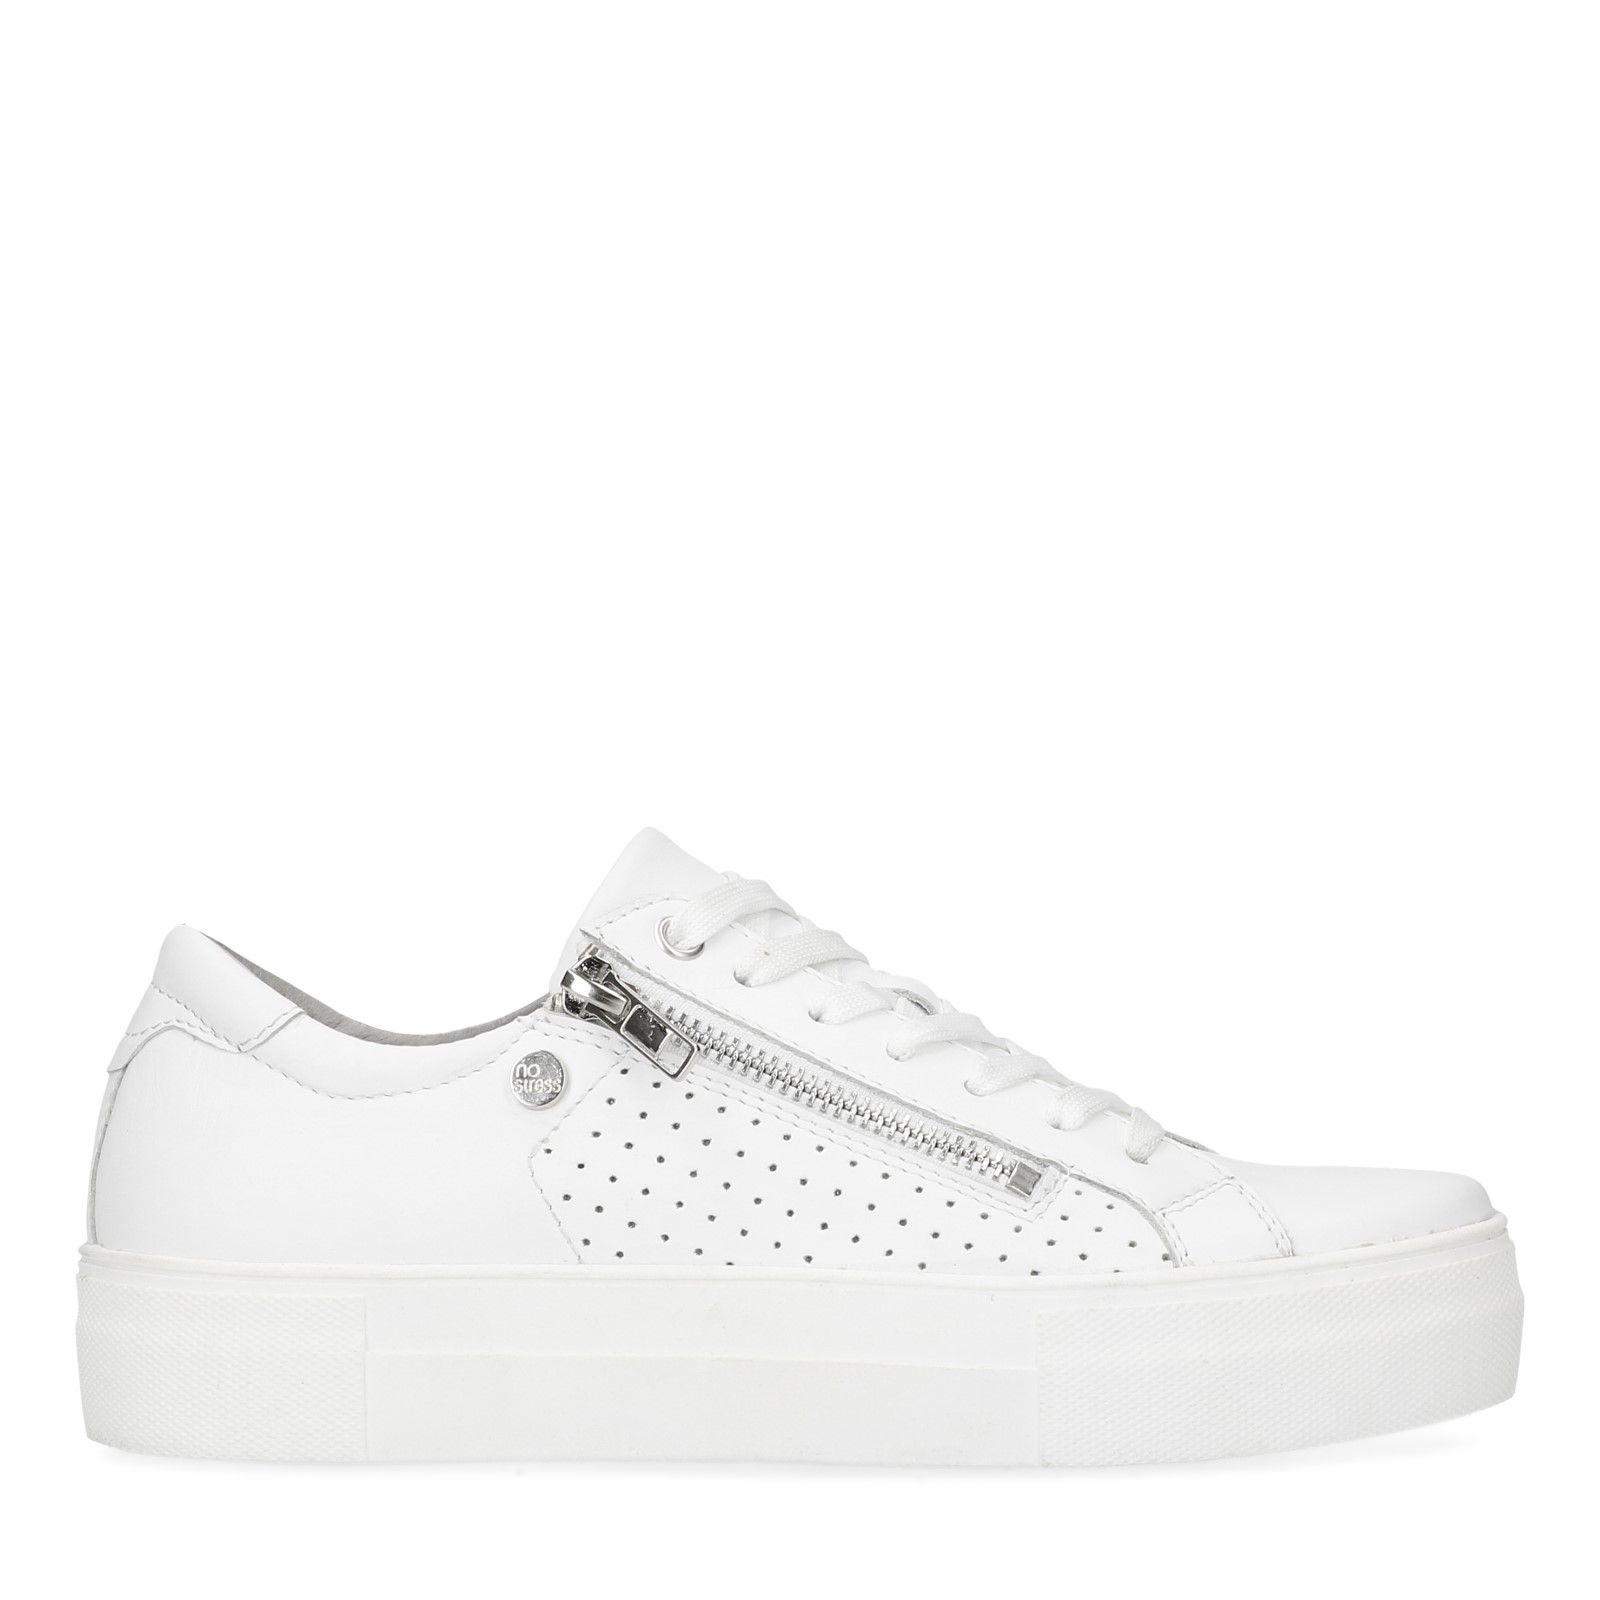 ca1199102e4cb3 Weiße Sneaker mit Reißverschluss